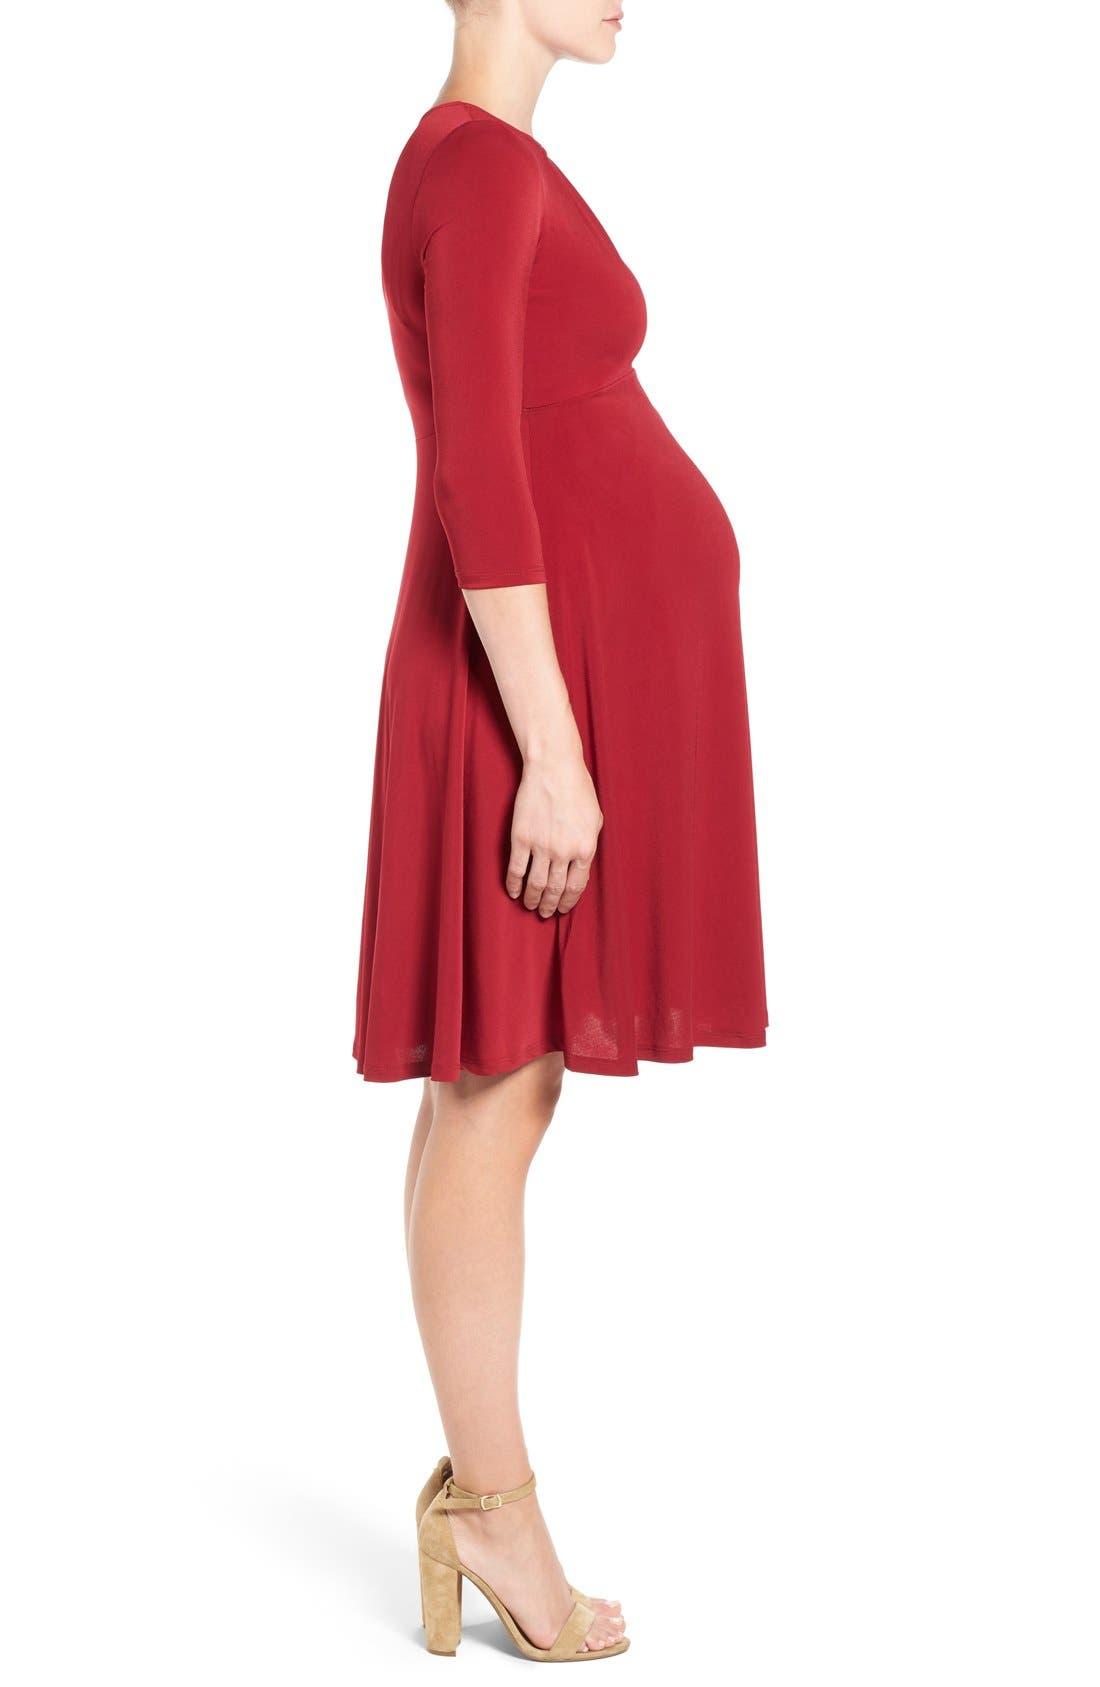 Leota simone empire waist jersey maternity dress wine modesens leota simone empire waist jersey maternity dress ombrellifo Image collections